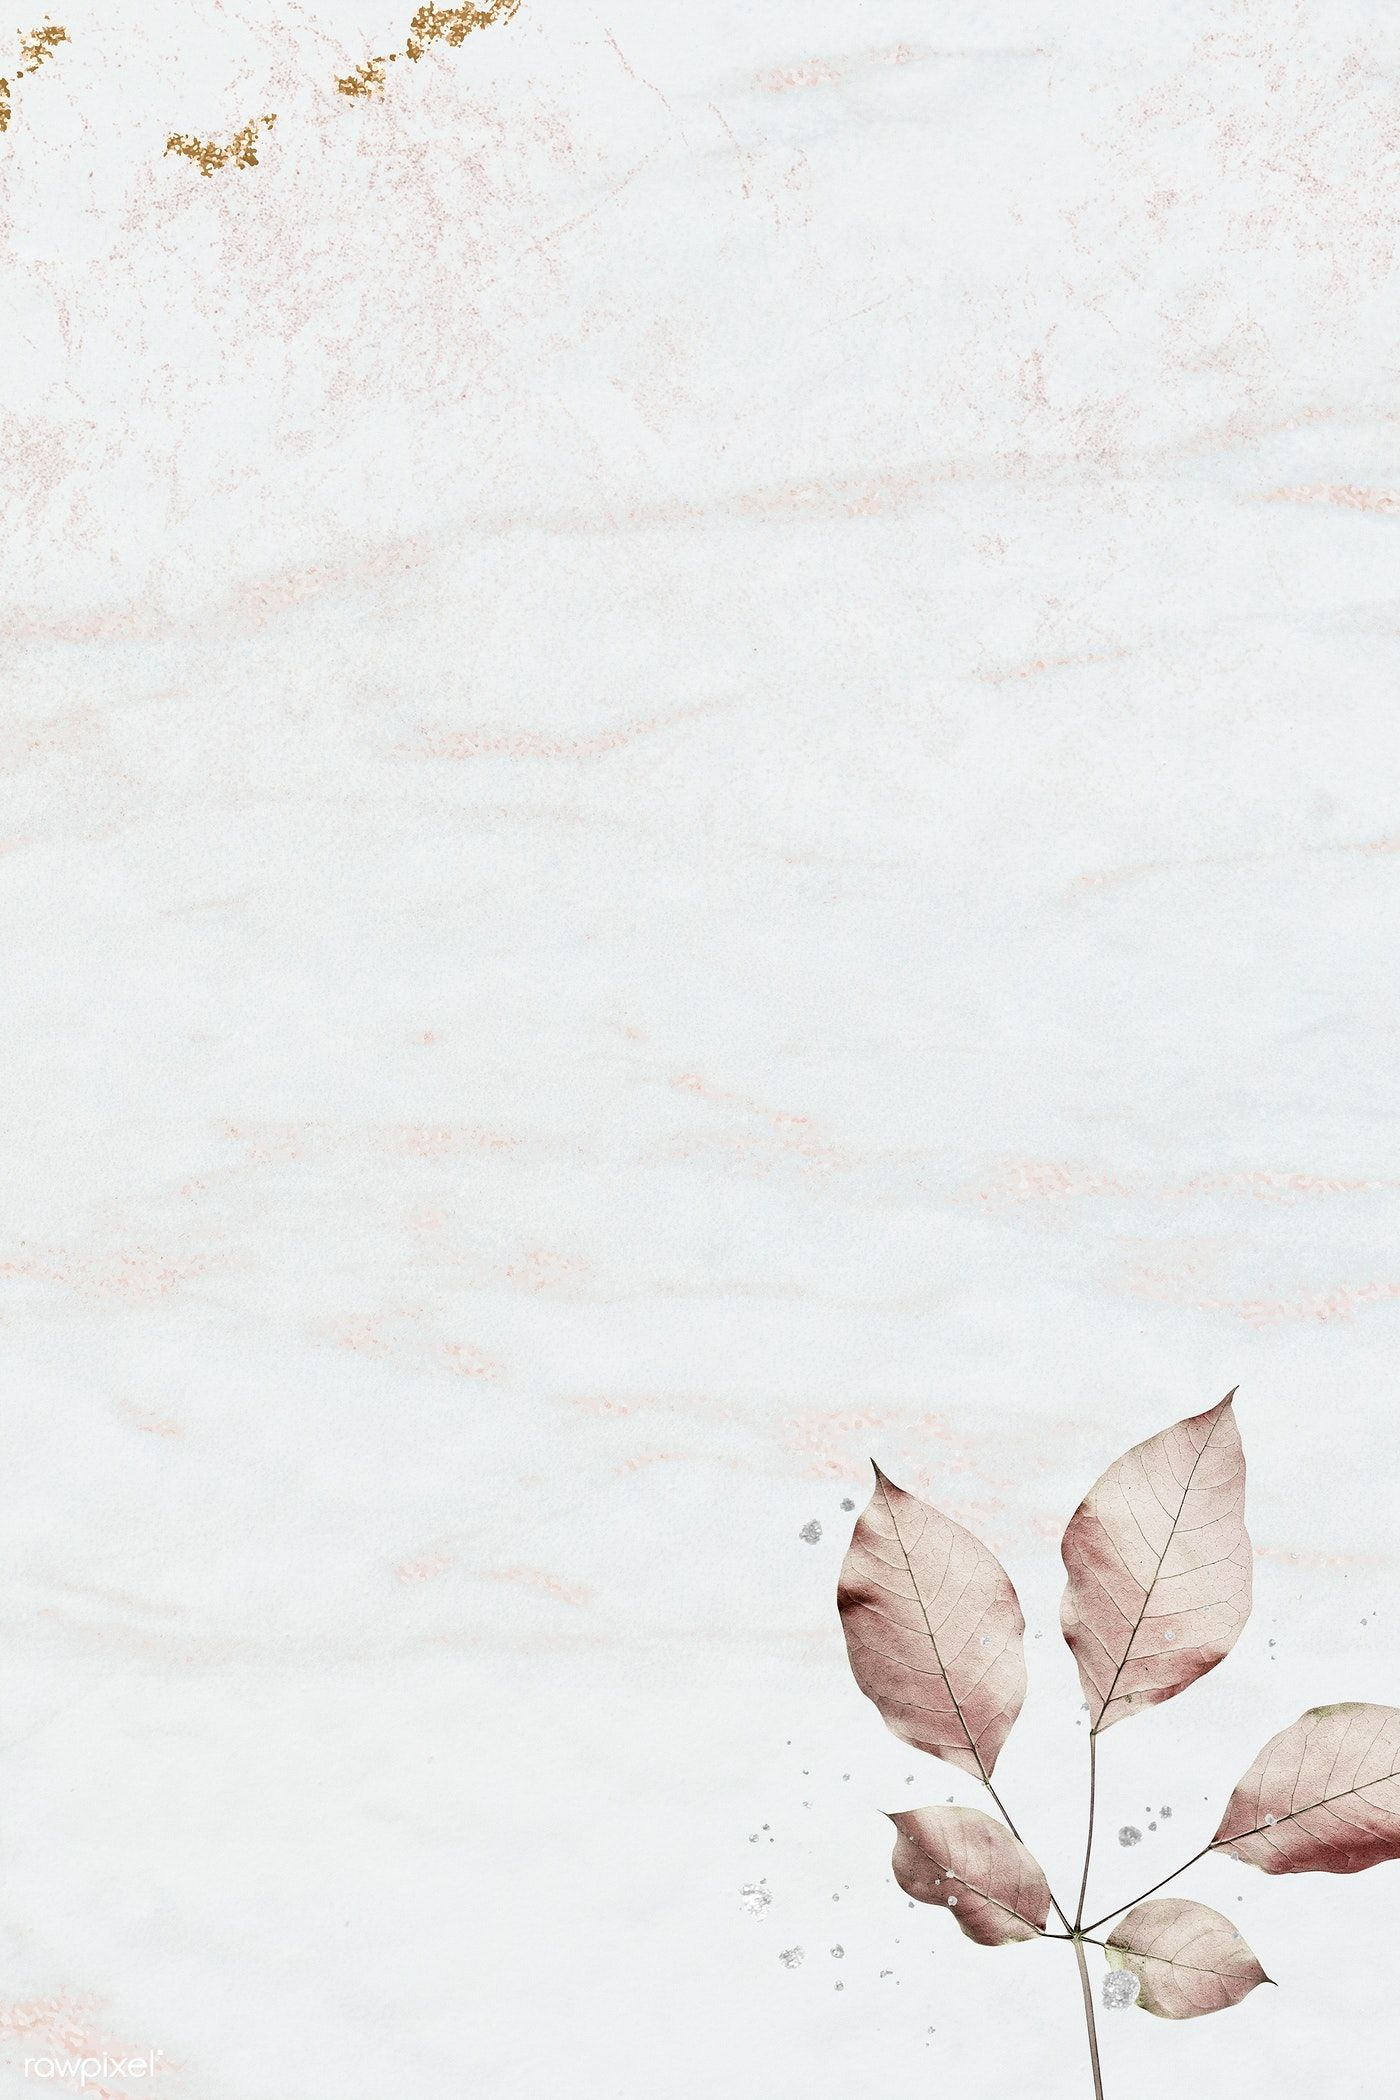 Download premium illustration of Pink leaf pattern on marble textured #marbletexture